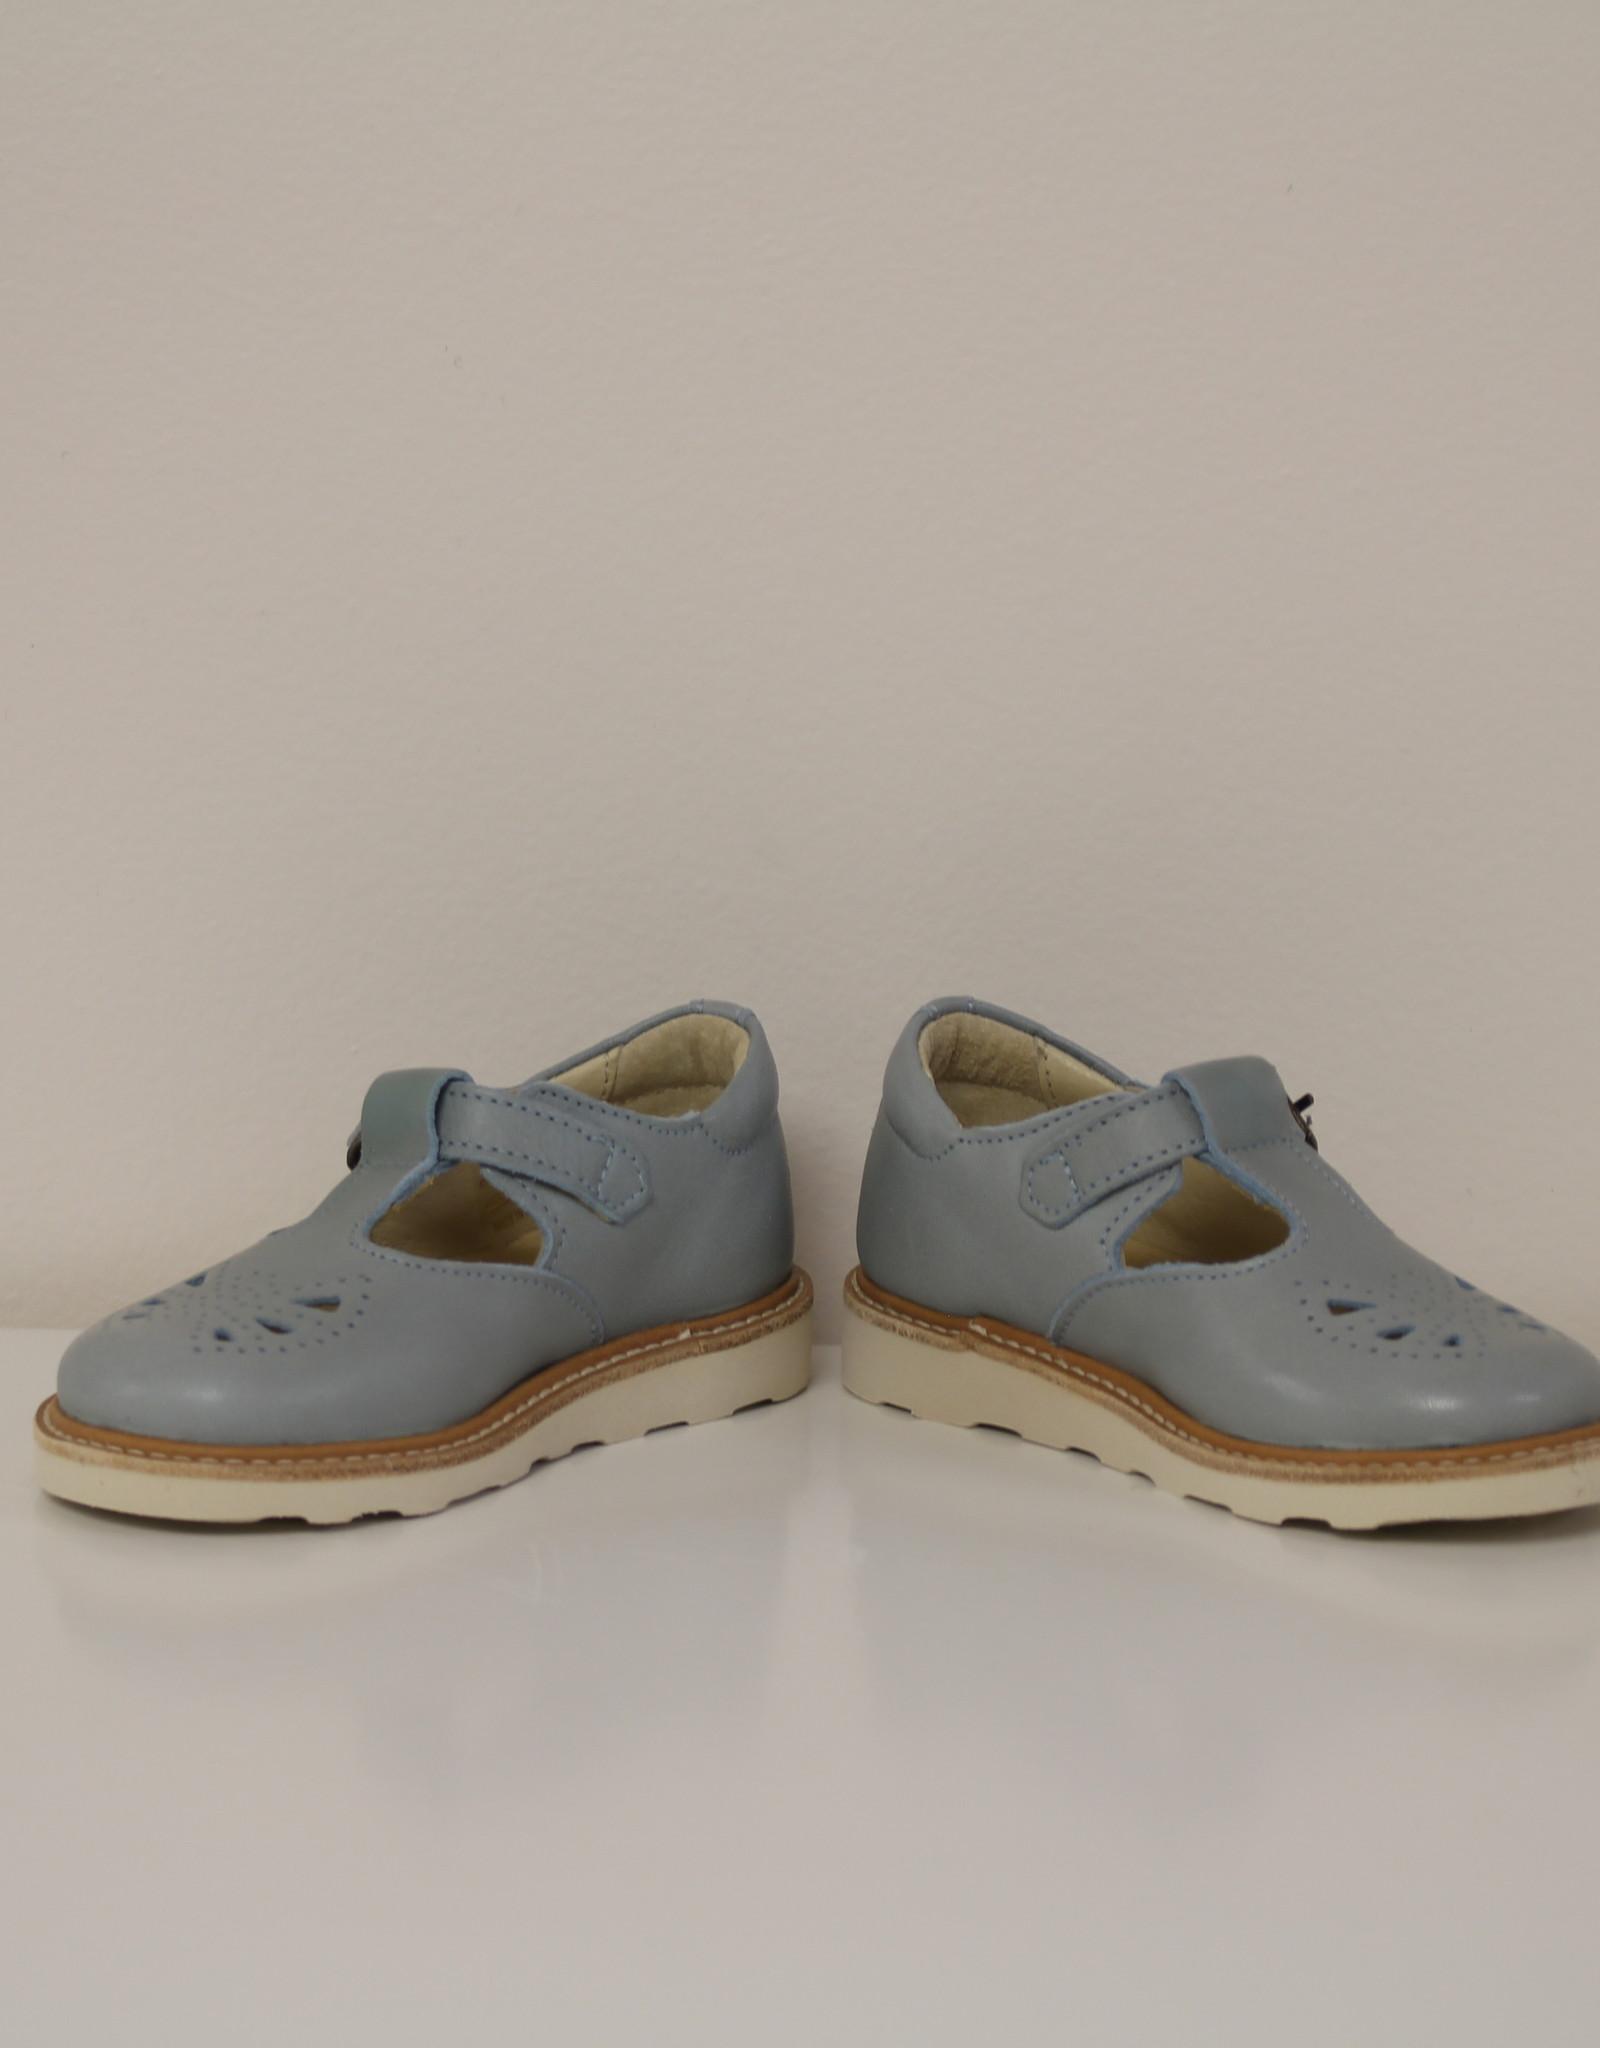 Young Soles t-bar shoe eva sole smokey sage